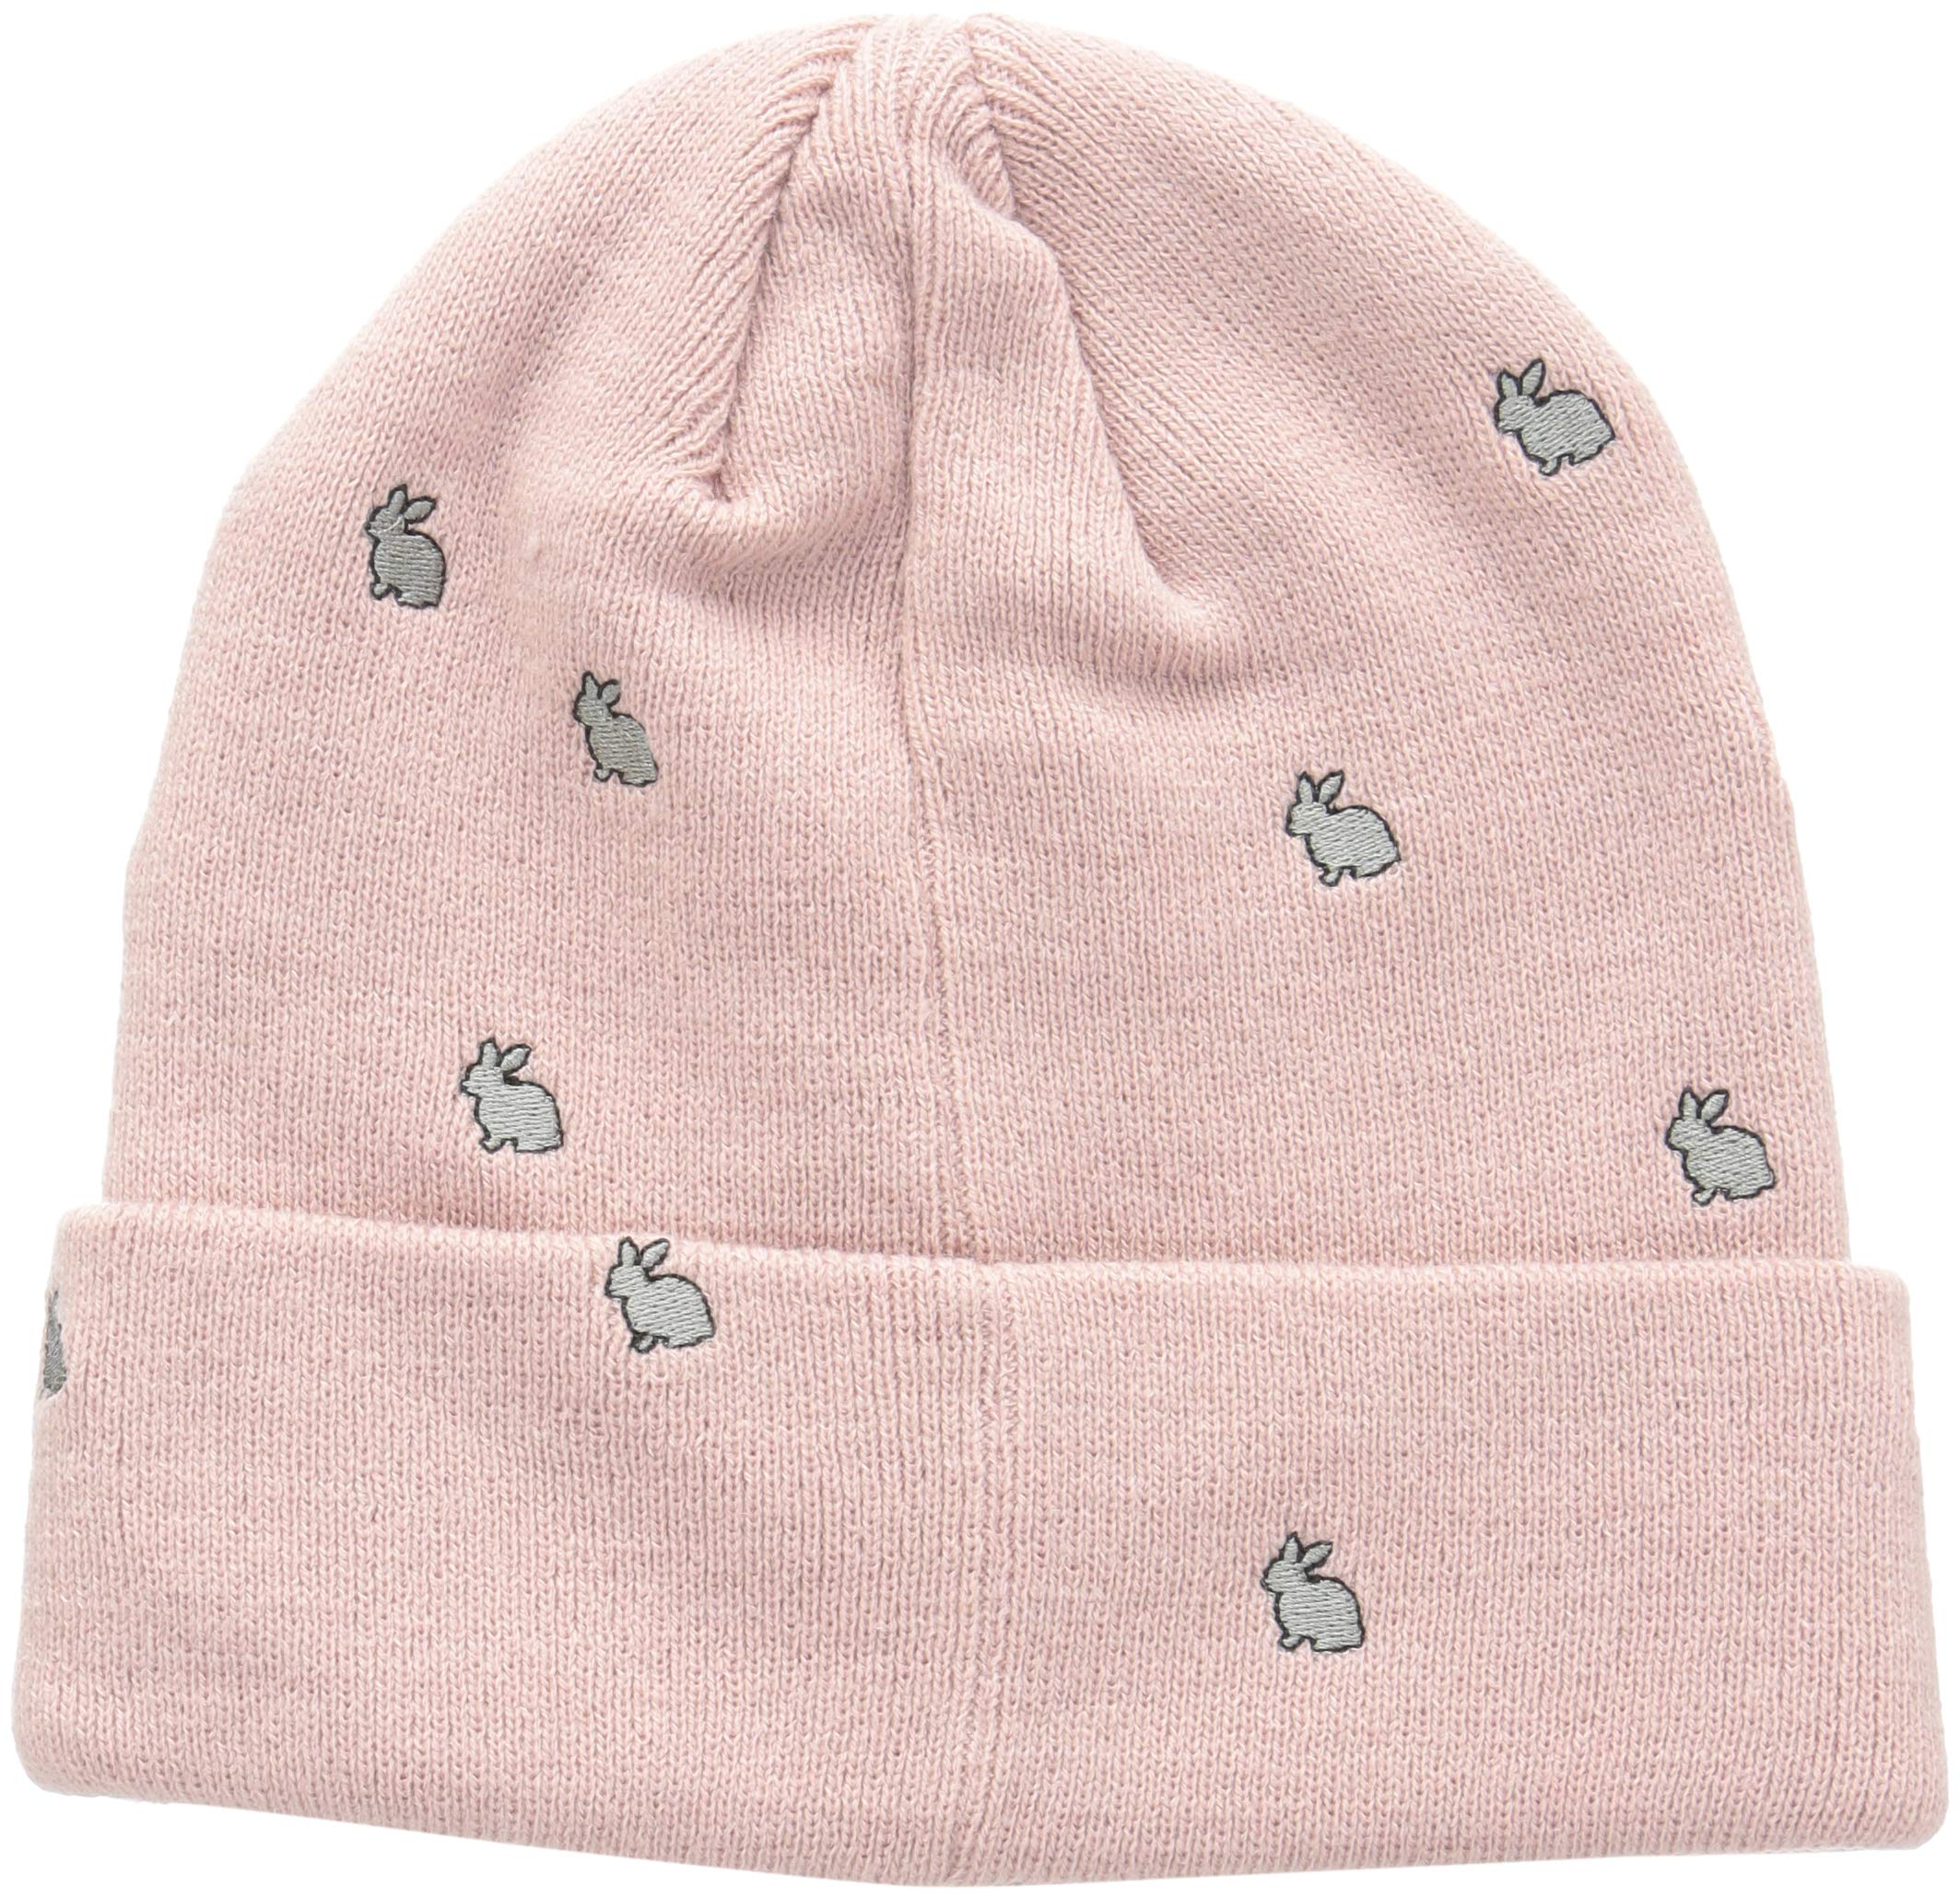 prAna Women's Wild Now Beanie Cold Weather Hats, One Size, Khaki Rose Bunny